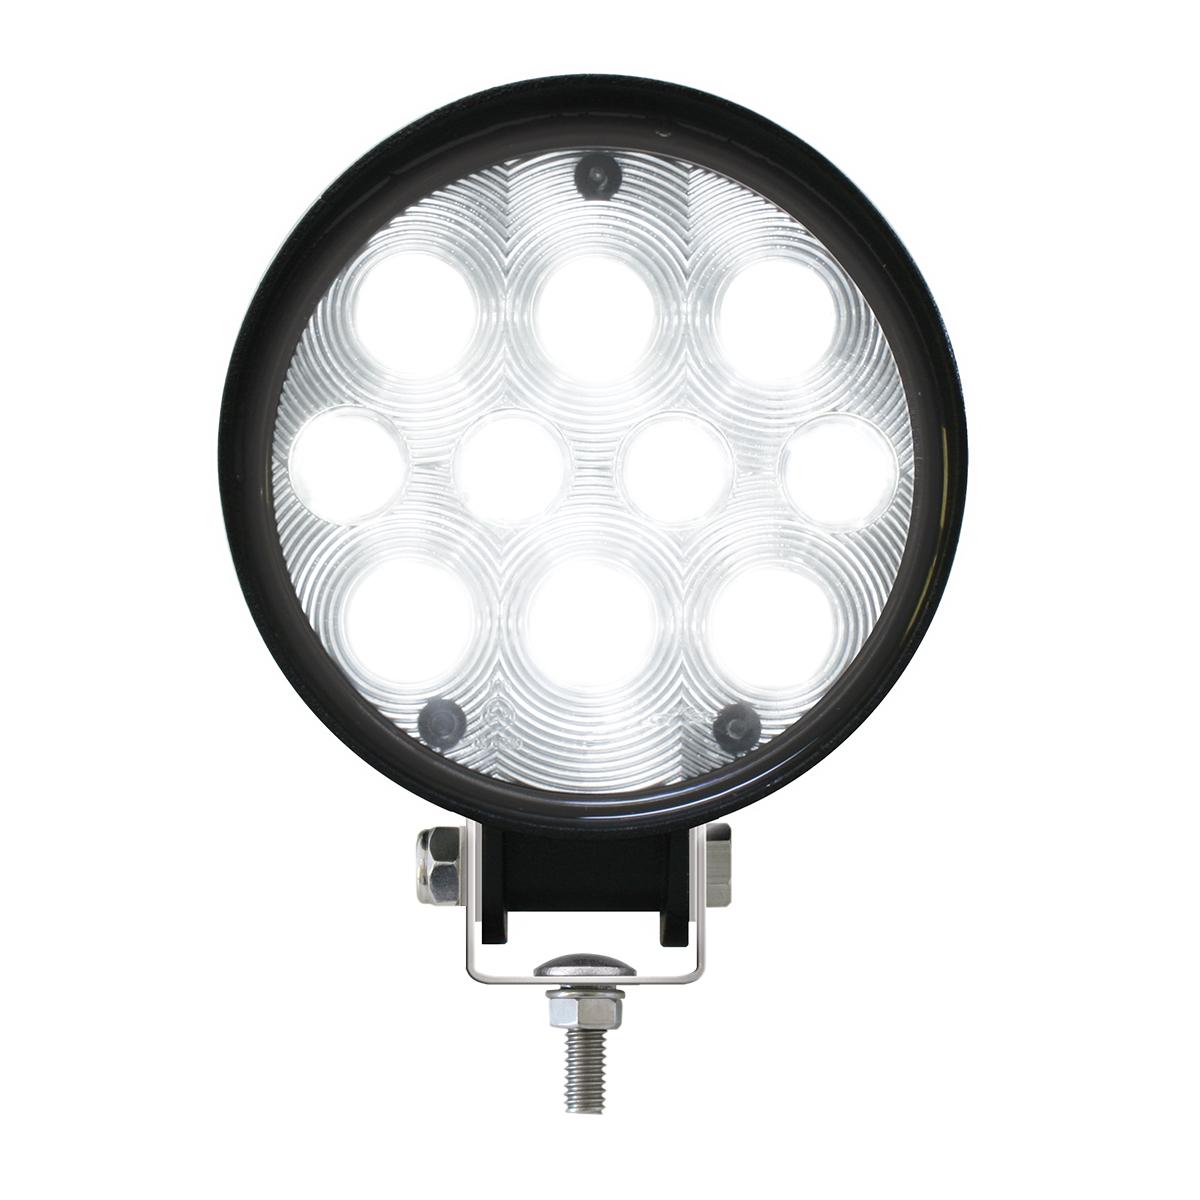 76353 Large High Power LED Work Light